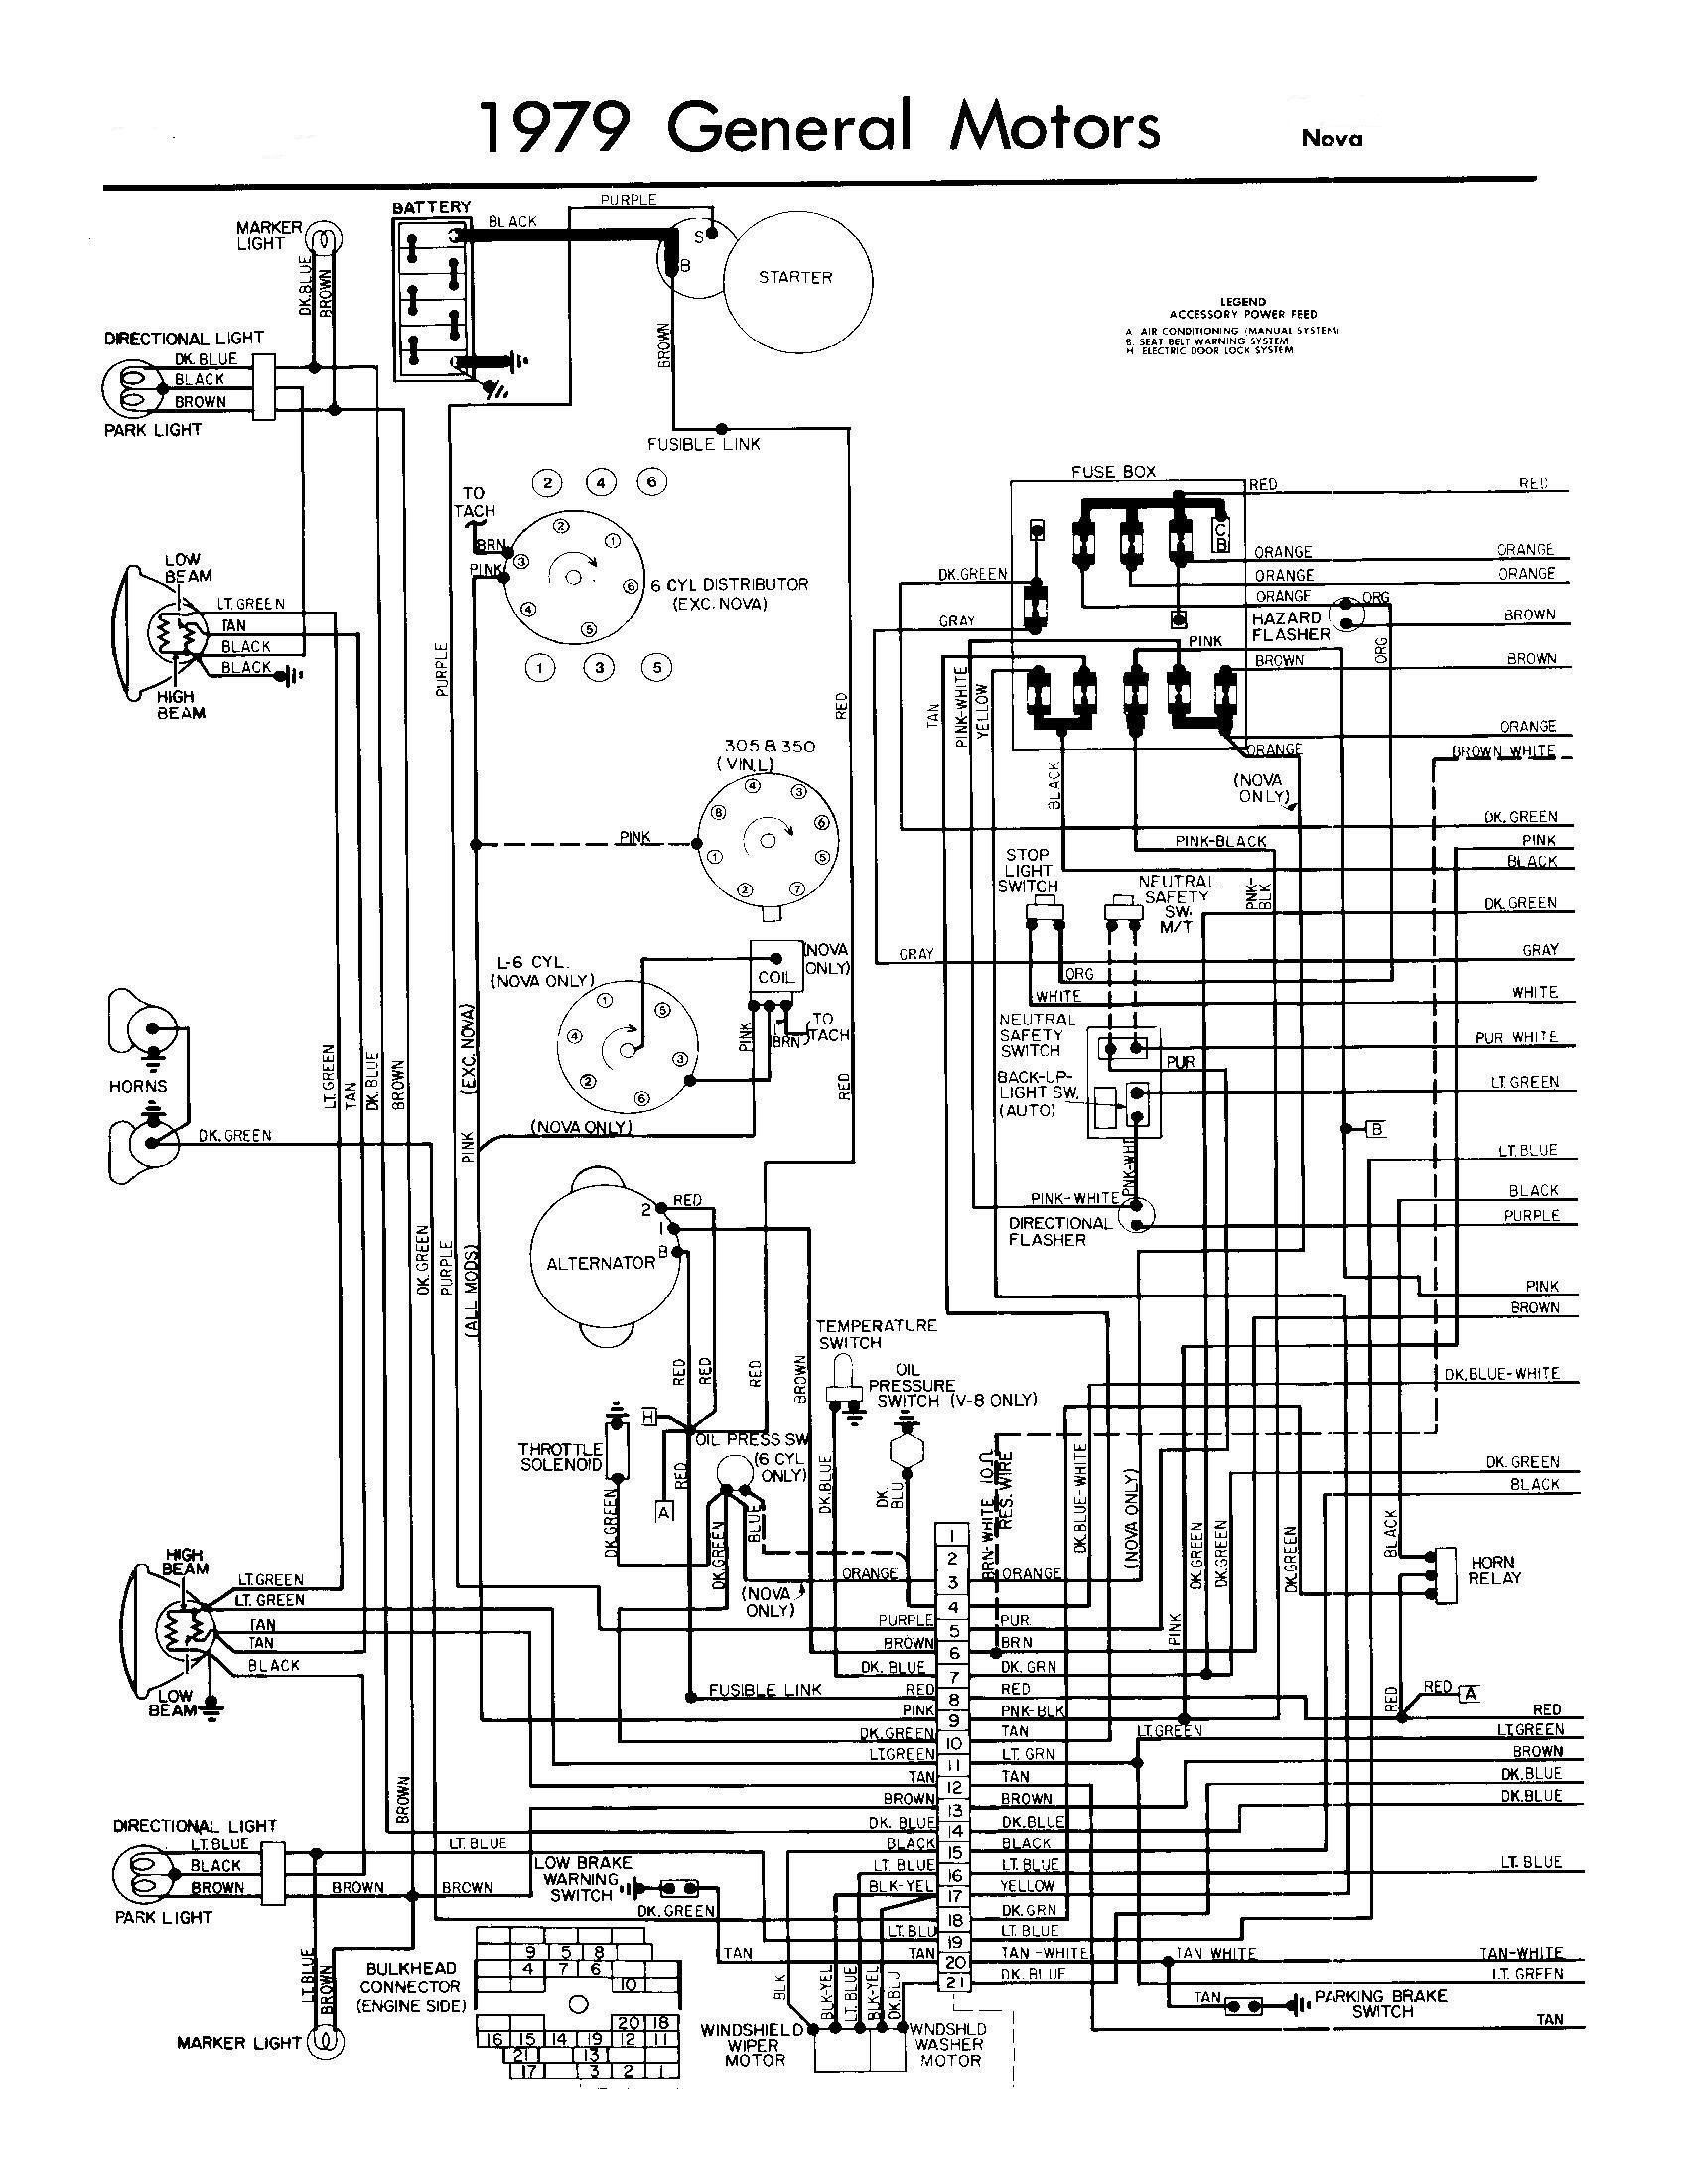 dodge ignition wiring diagram 1962 chevy nova wiring diagram